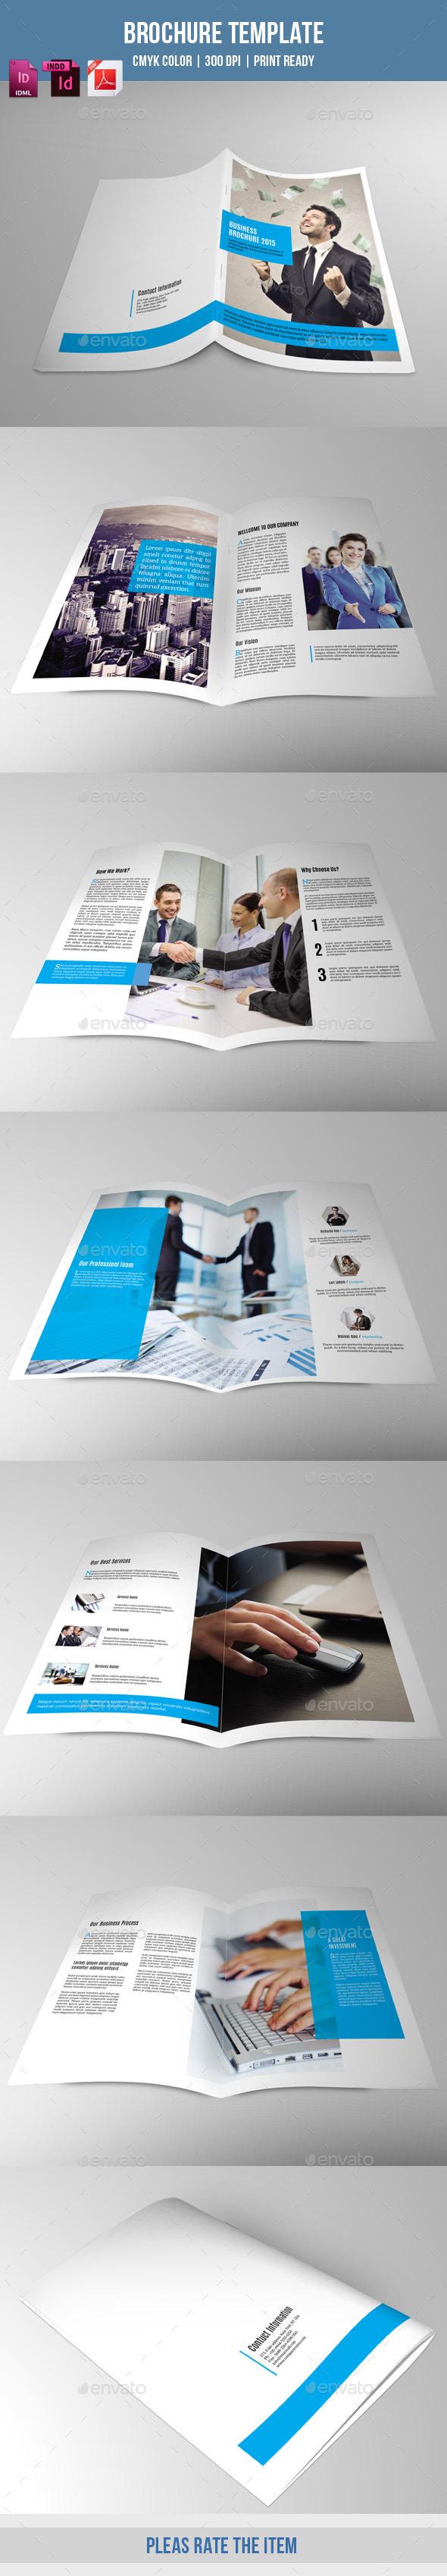 Bifold Brochure for Business-V162 - Corporate Brochures